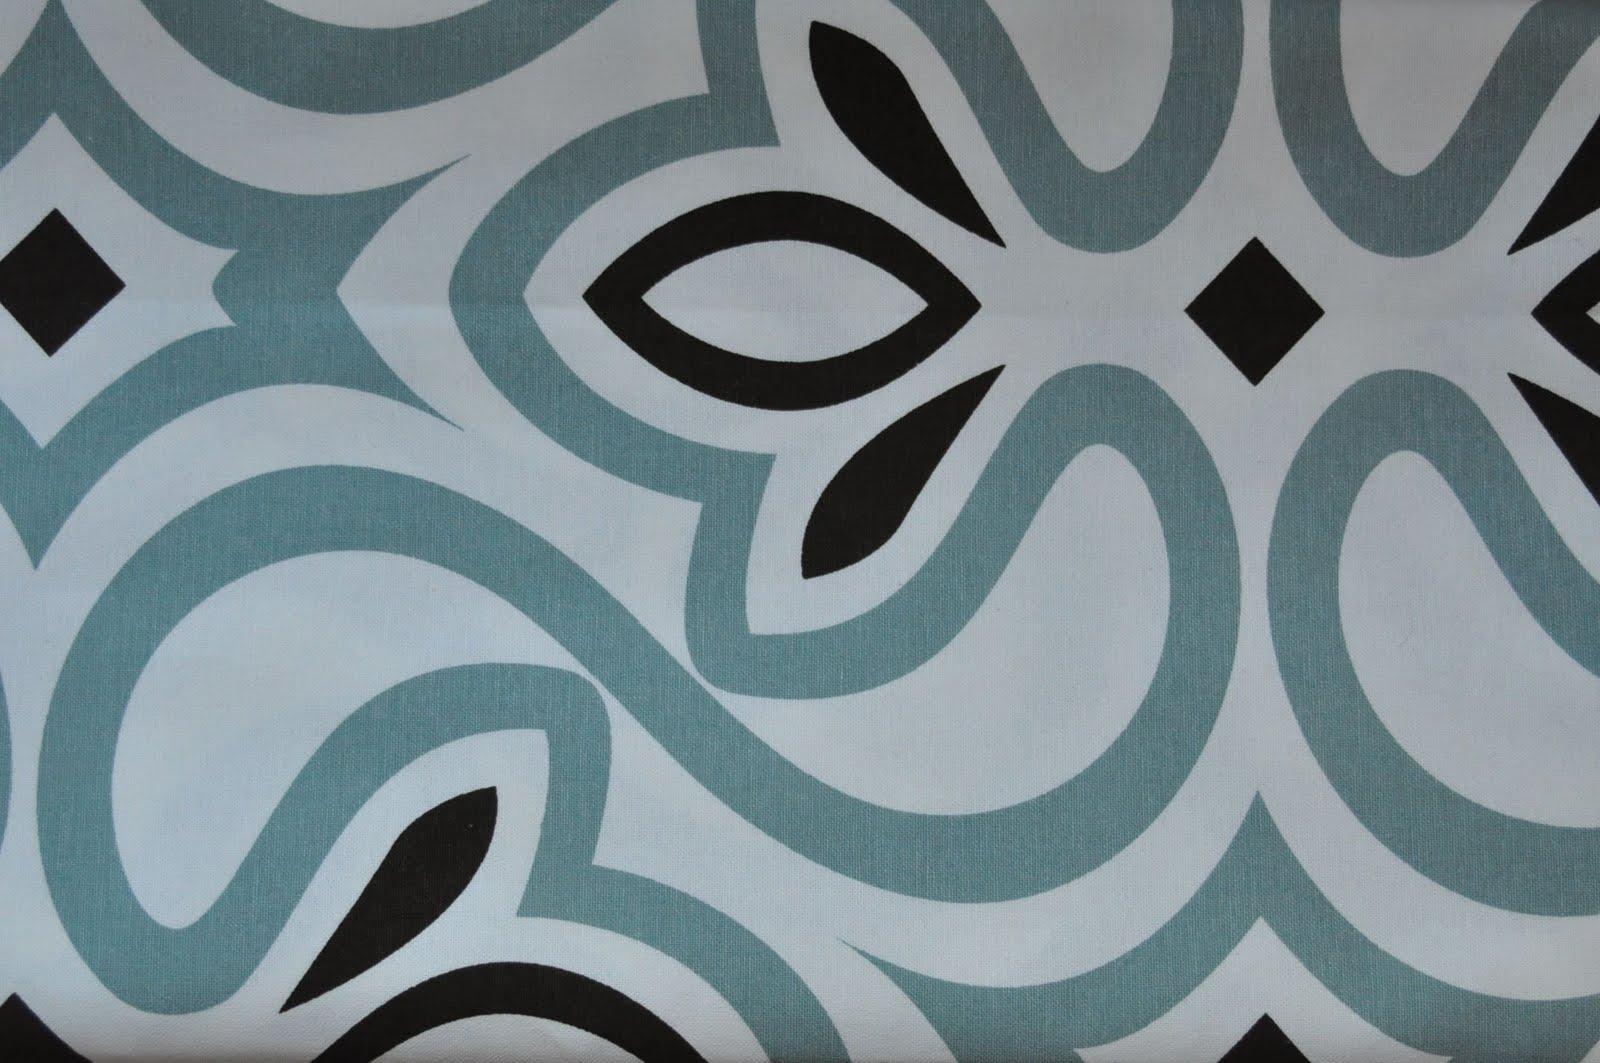 Ro Ro Roman Shade Curtain Patterns - The tutorial enter faux roman shade